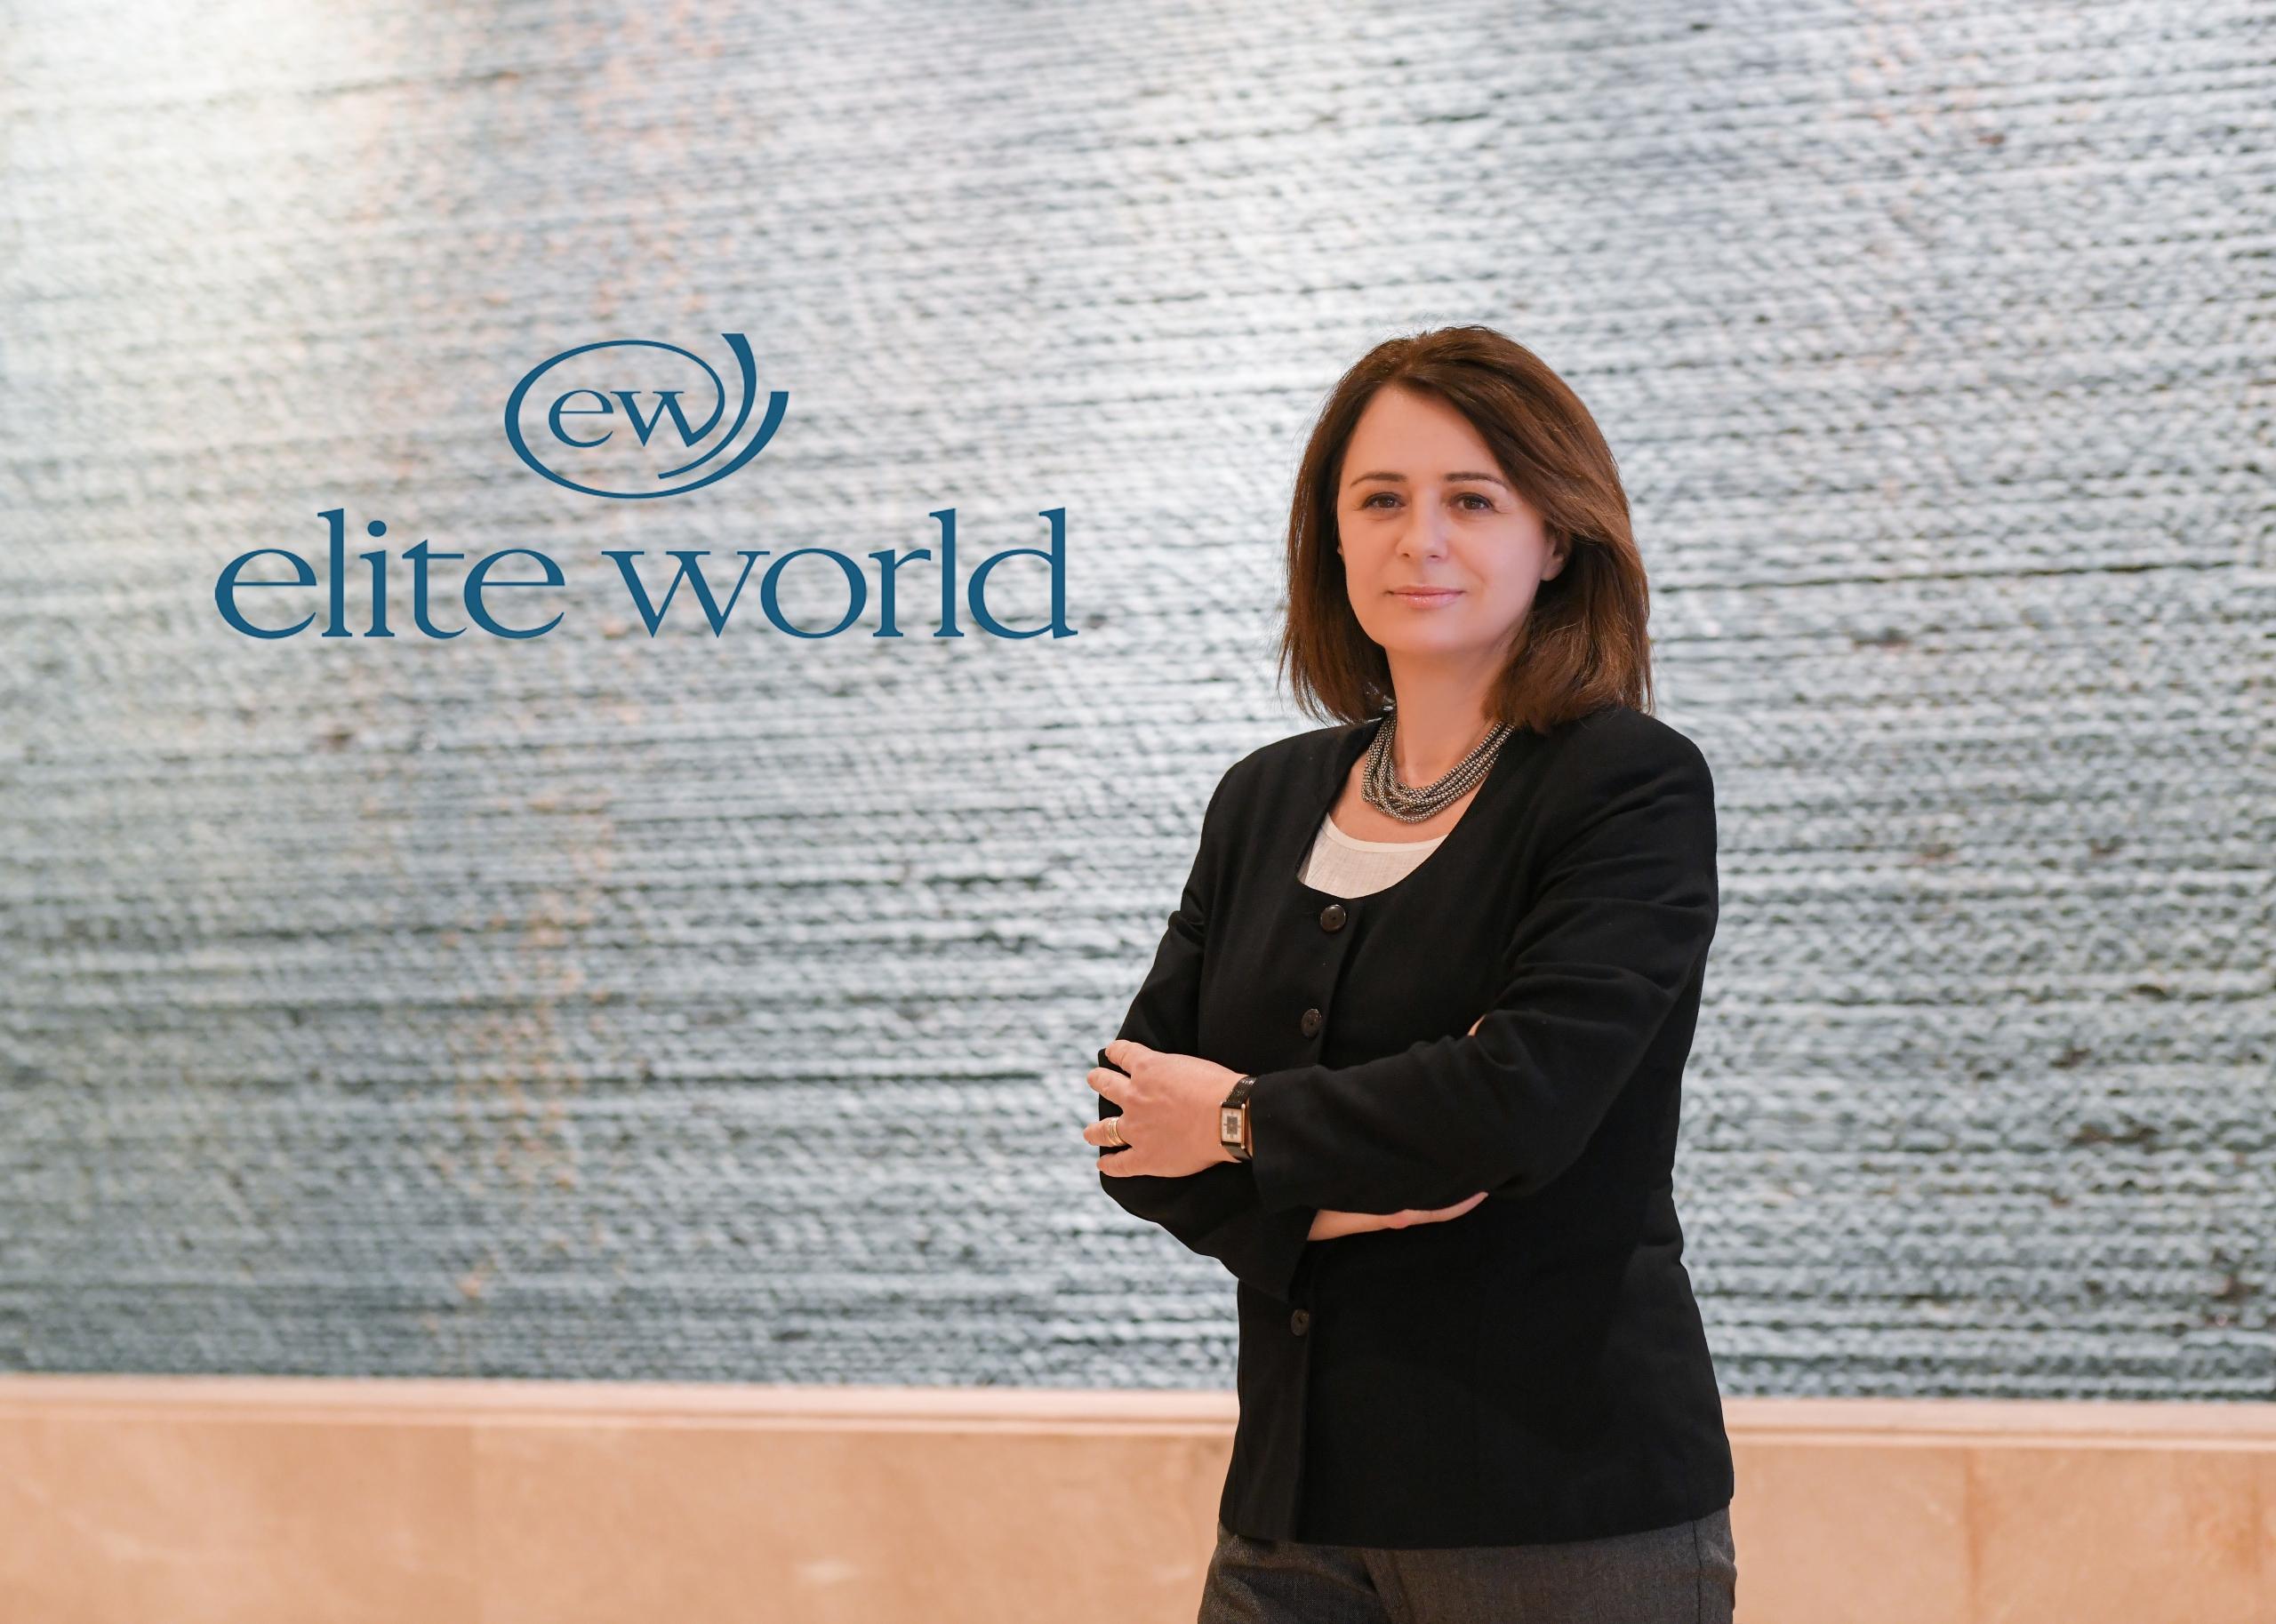 ELİTE WORLD HOTELS'DEN ÖNEMLİ ATAMALAR